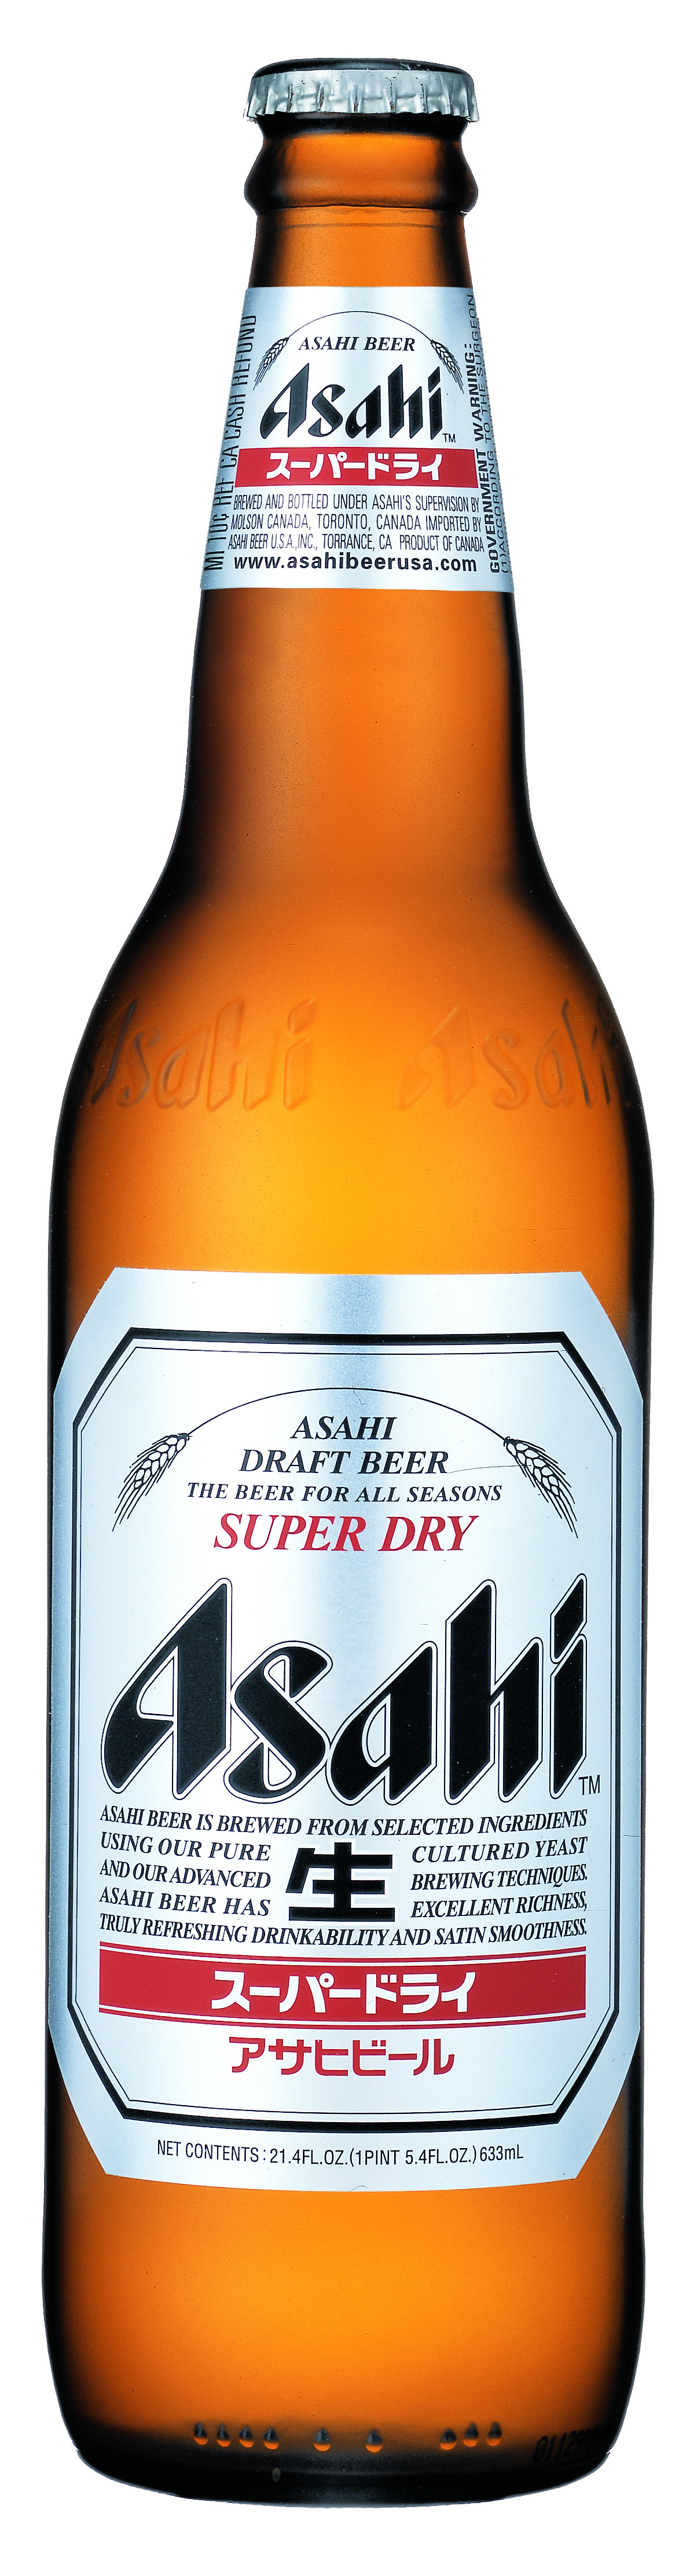 asahi breweries 抽選で総計500名様に、新発売『アサヒ グランマイルド』プレゼント、その場で当たりがわかるキャンペーン.